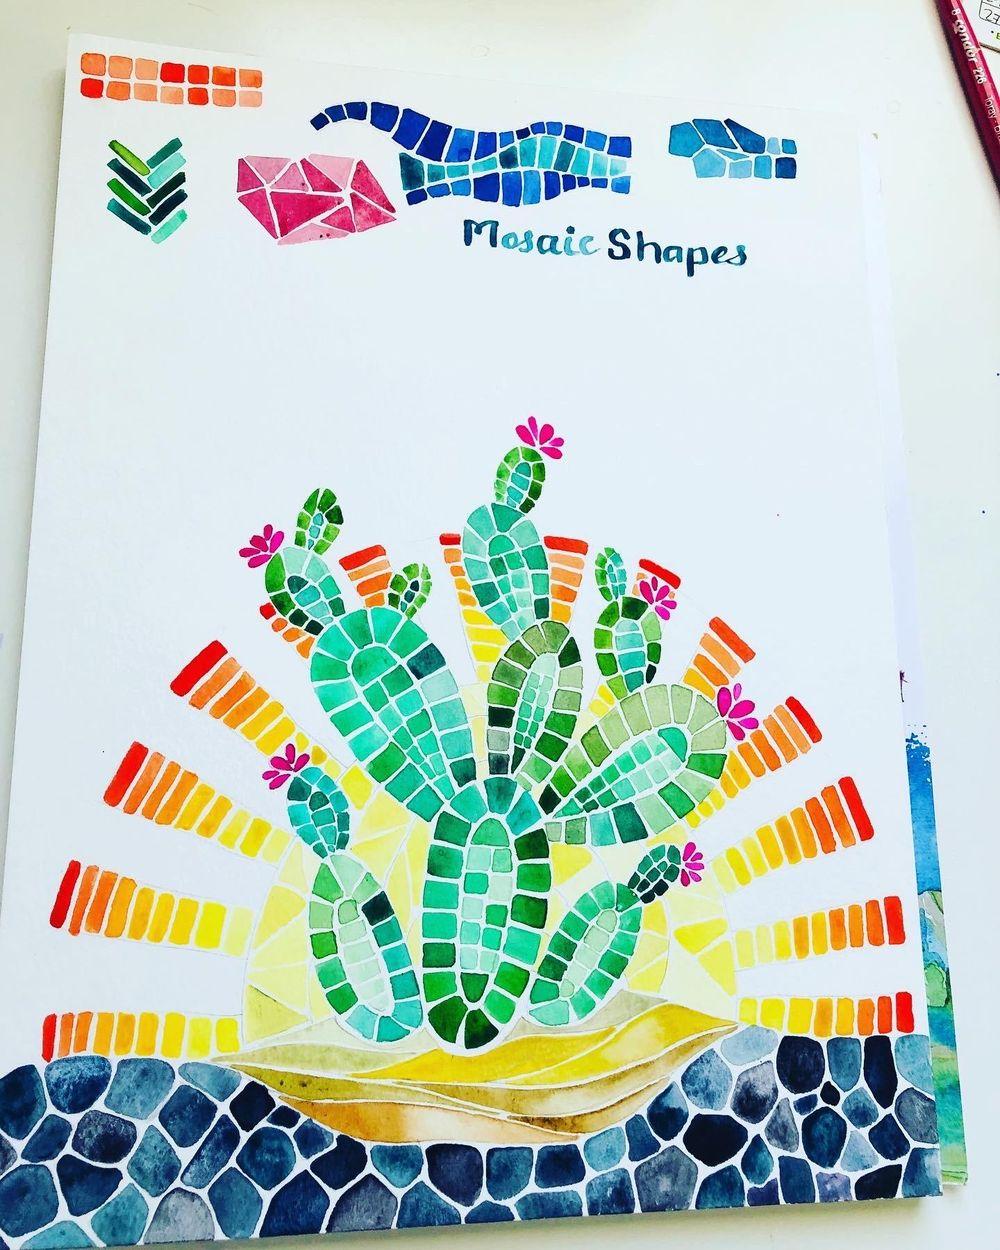 Desert Cacti Horizon Watercolor Mosaic process and final piece - image 2 - student project